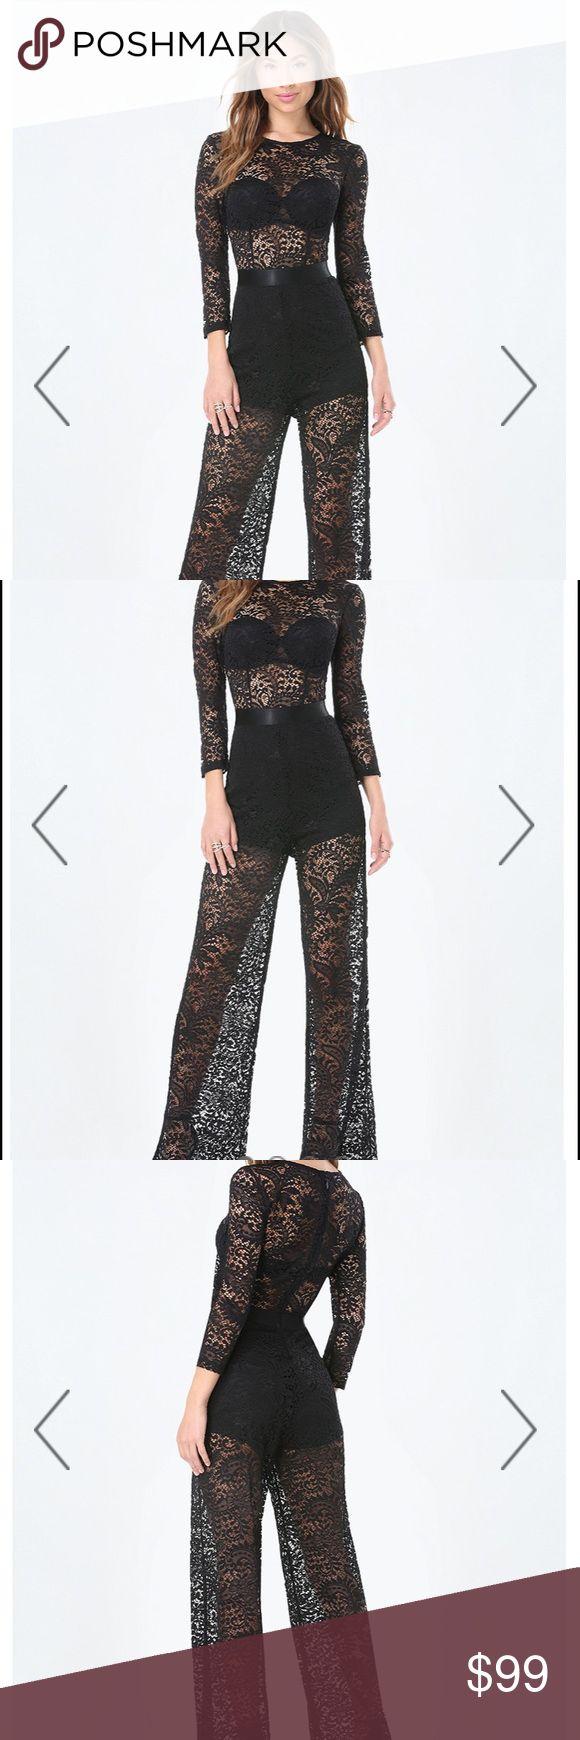 Bebe Black Lace Jumpsuit New without tags. Sz XS bebe Pants Jumpsuits & Rompers